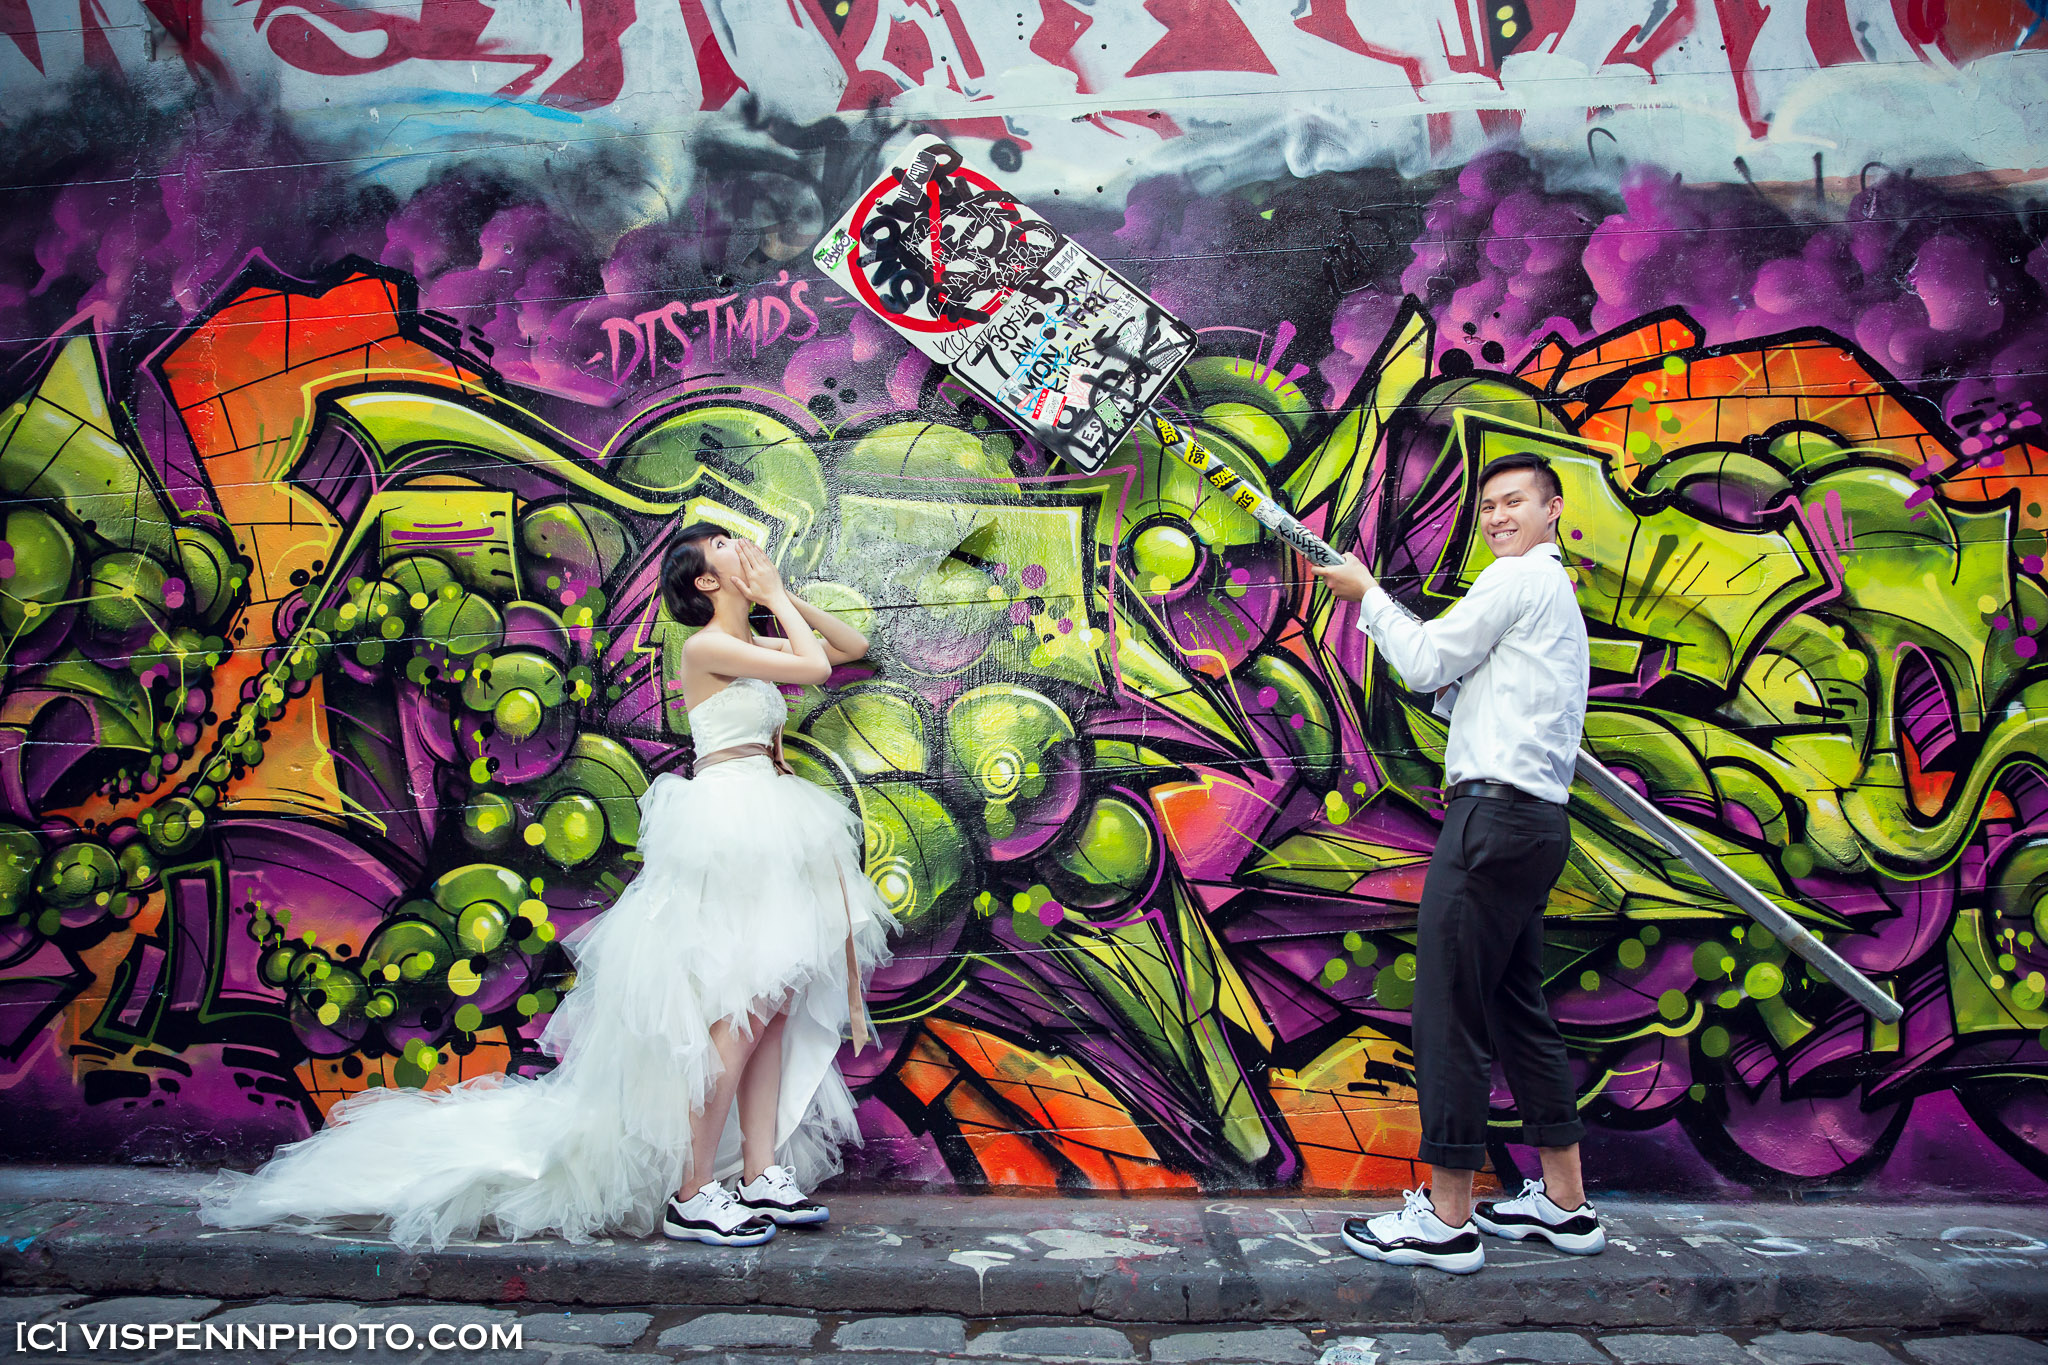 PRE WEDDING Photography Melbourne VISPENN 墨尔本 婚纱照 结婚照 婚纱摄影 Ivy PreWedding 4164